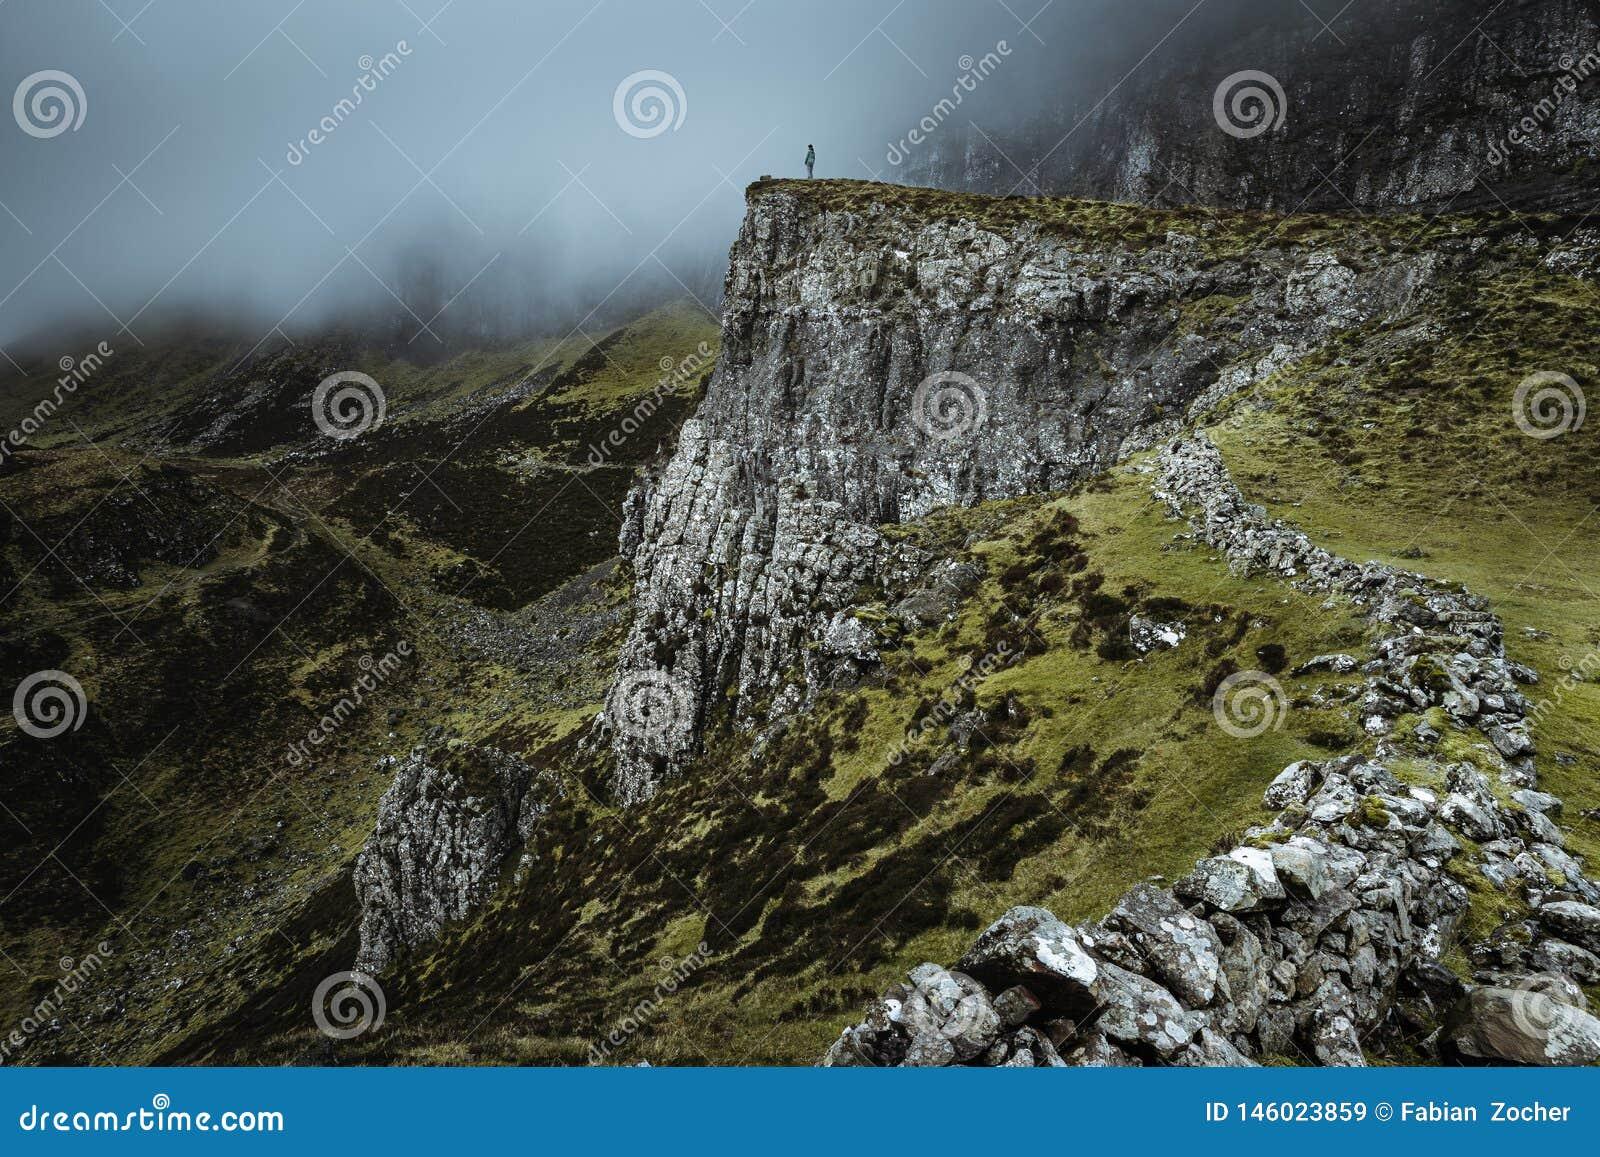 Quiraing - the most beautiful landscape in Scotland